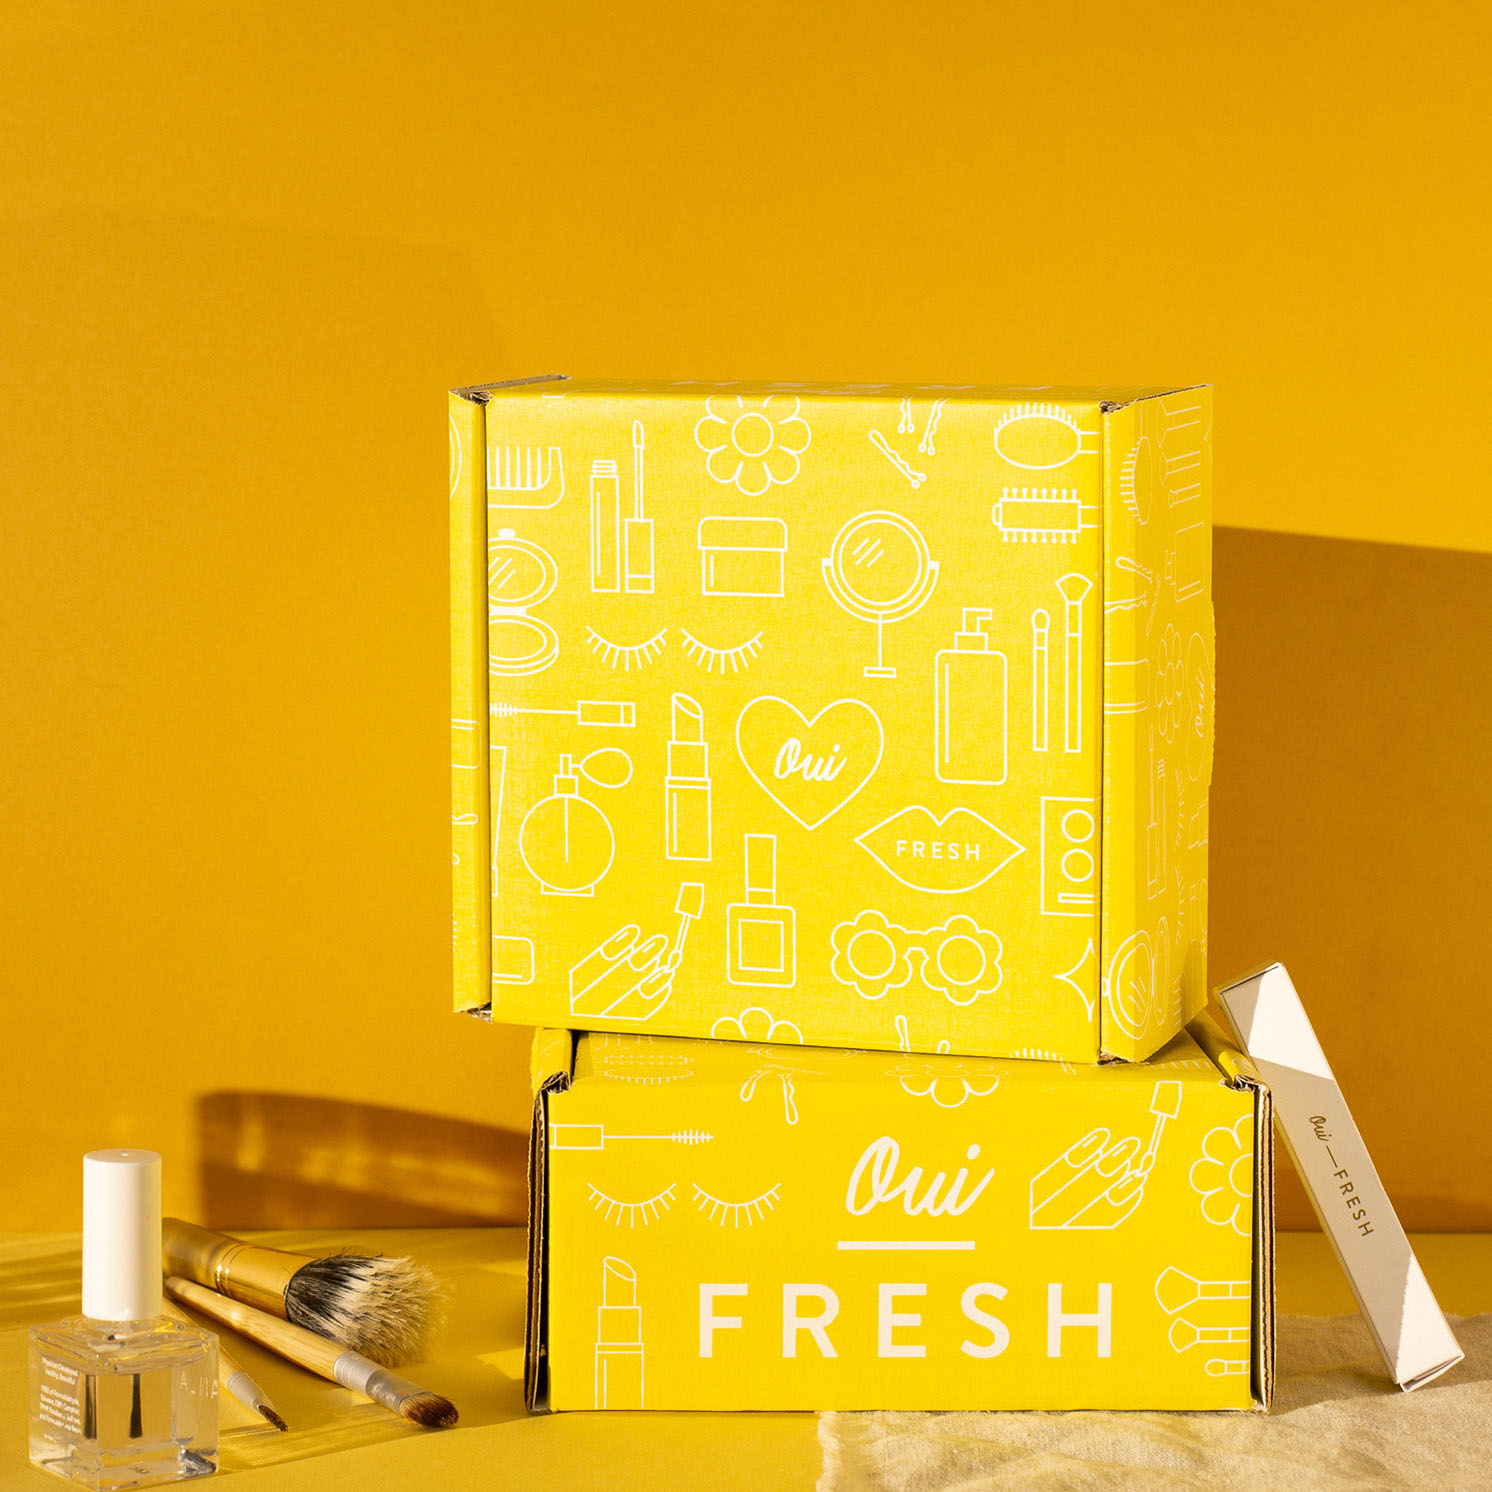 oui-fresh-beauty-box-yellow-mara-dawn-design-square.jpg